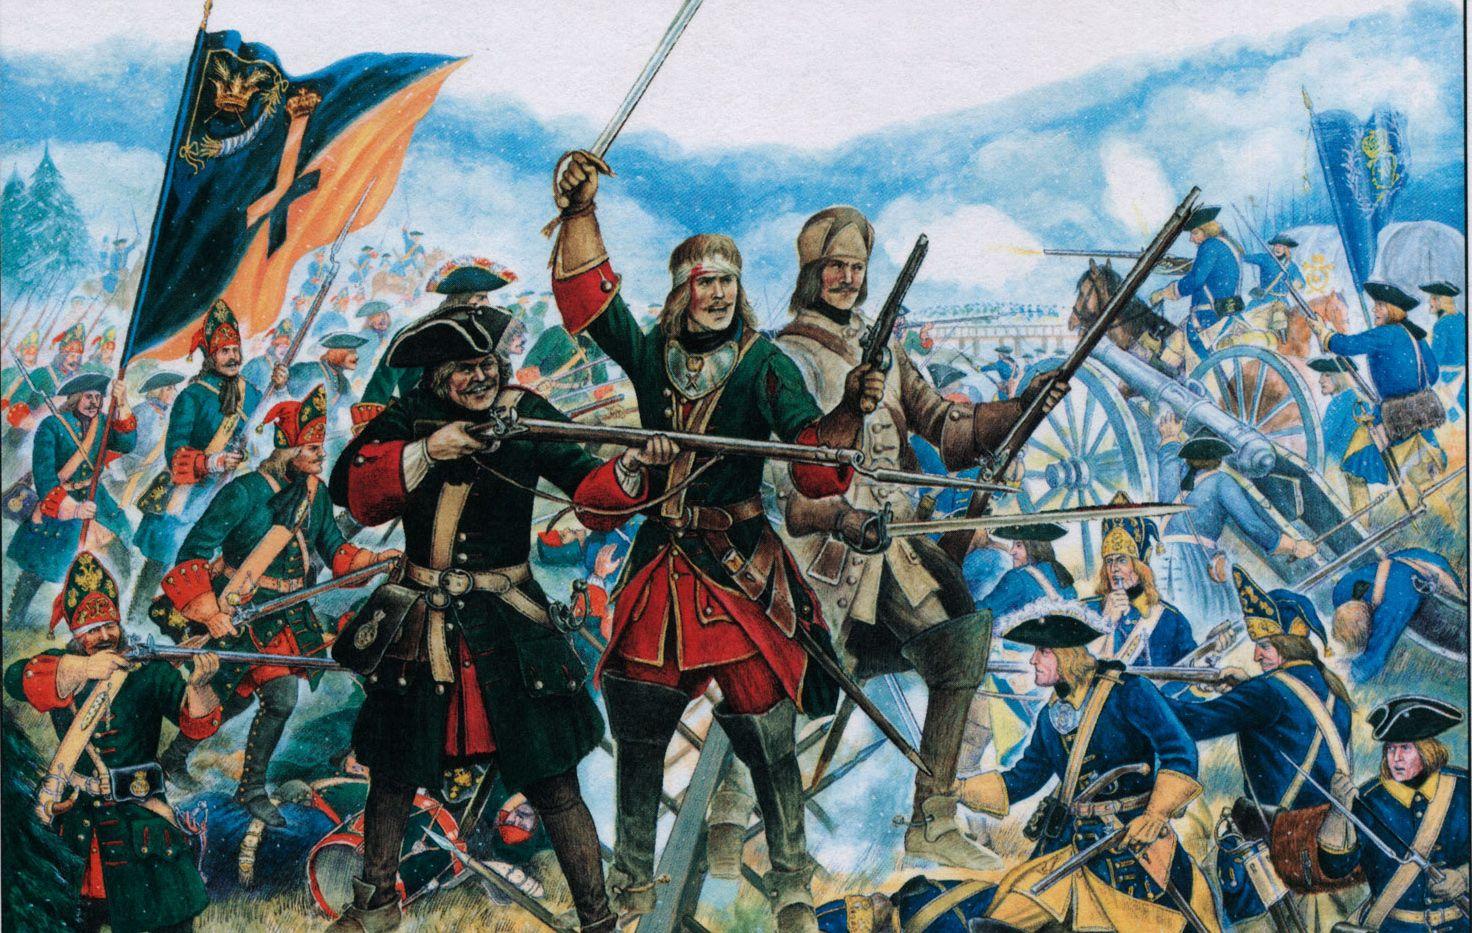 Battle of Poltava | Military art, War art, Art of fighting